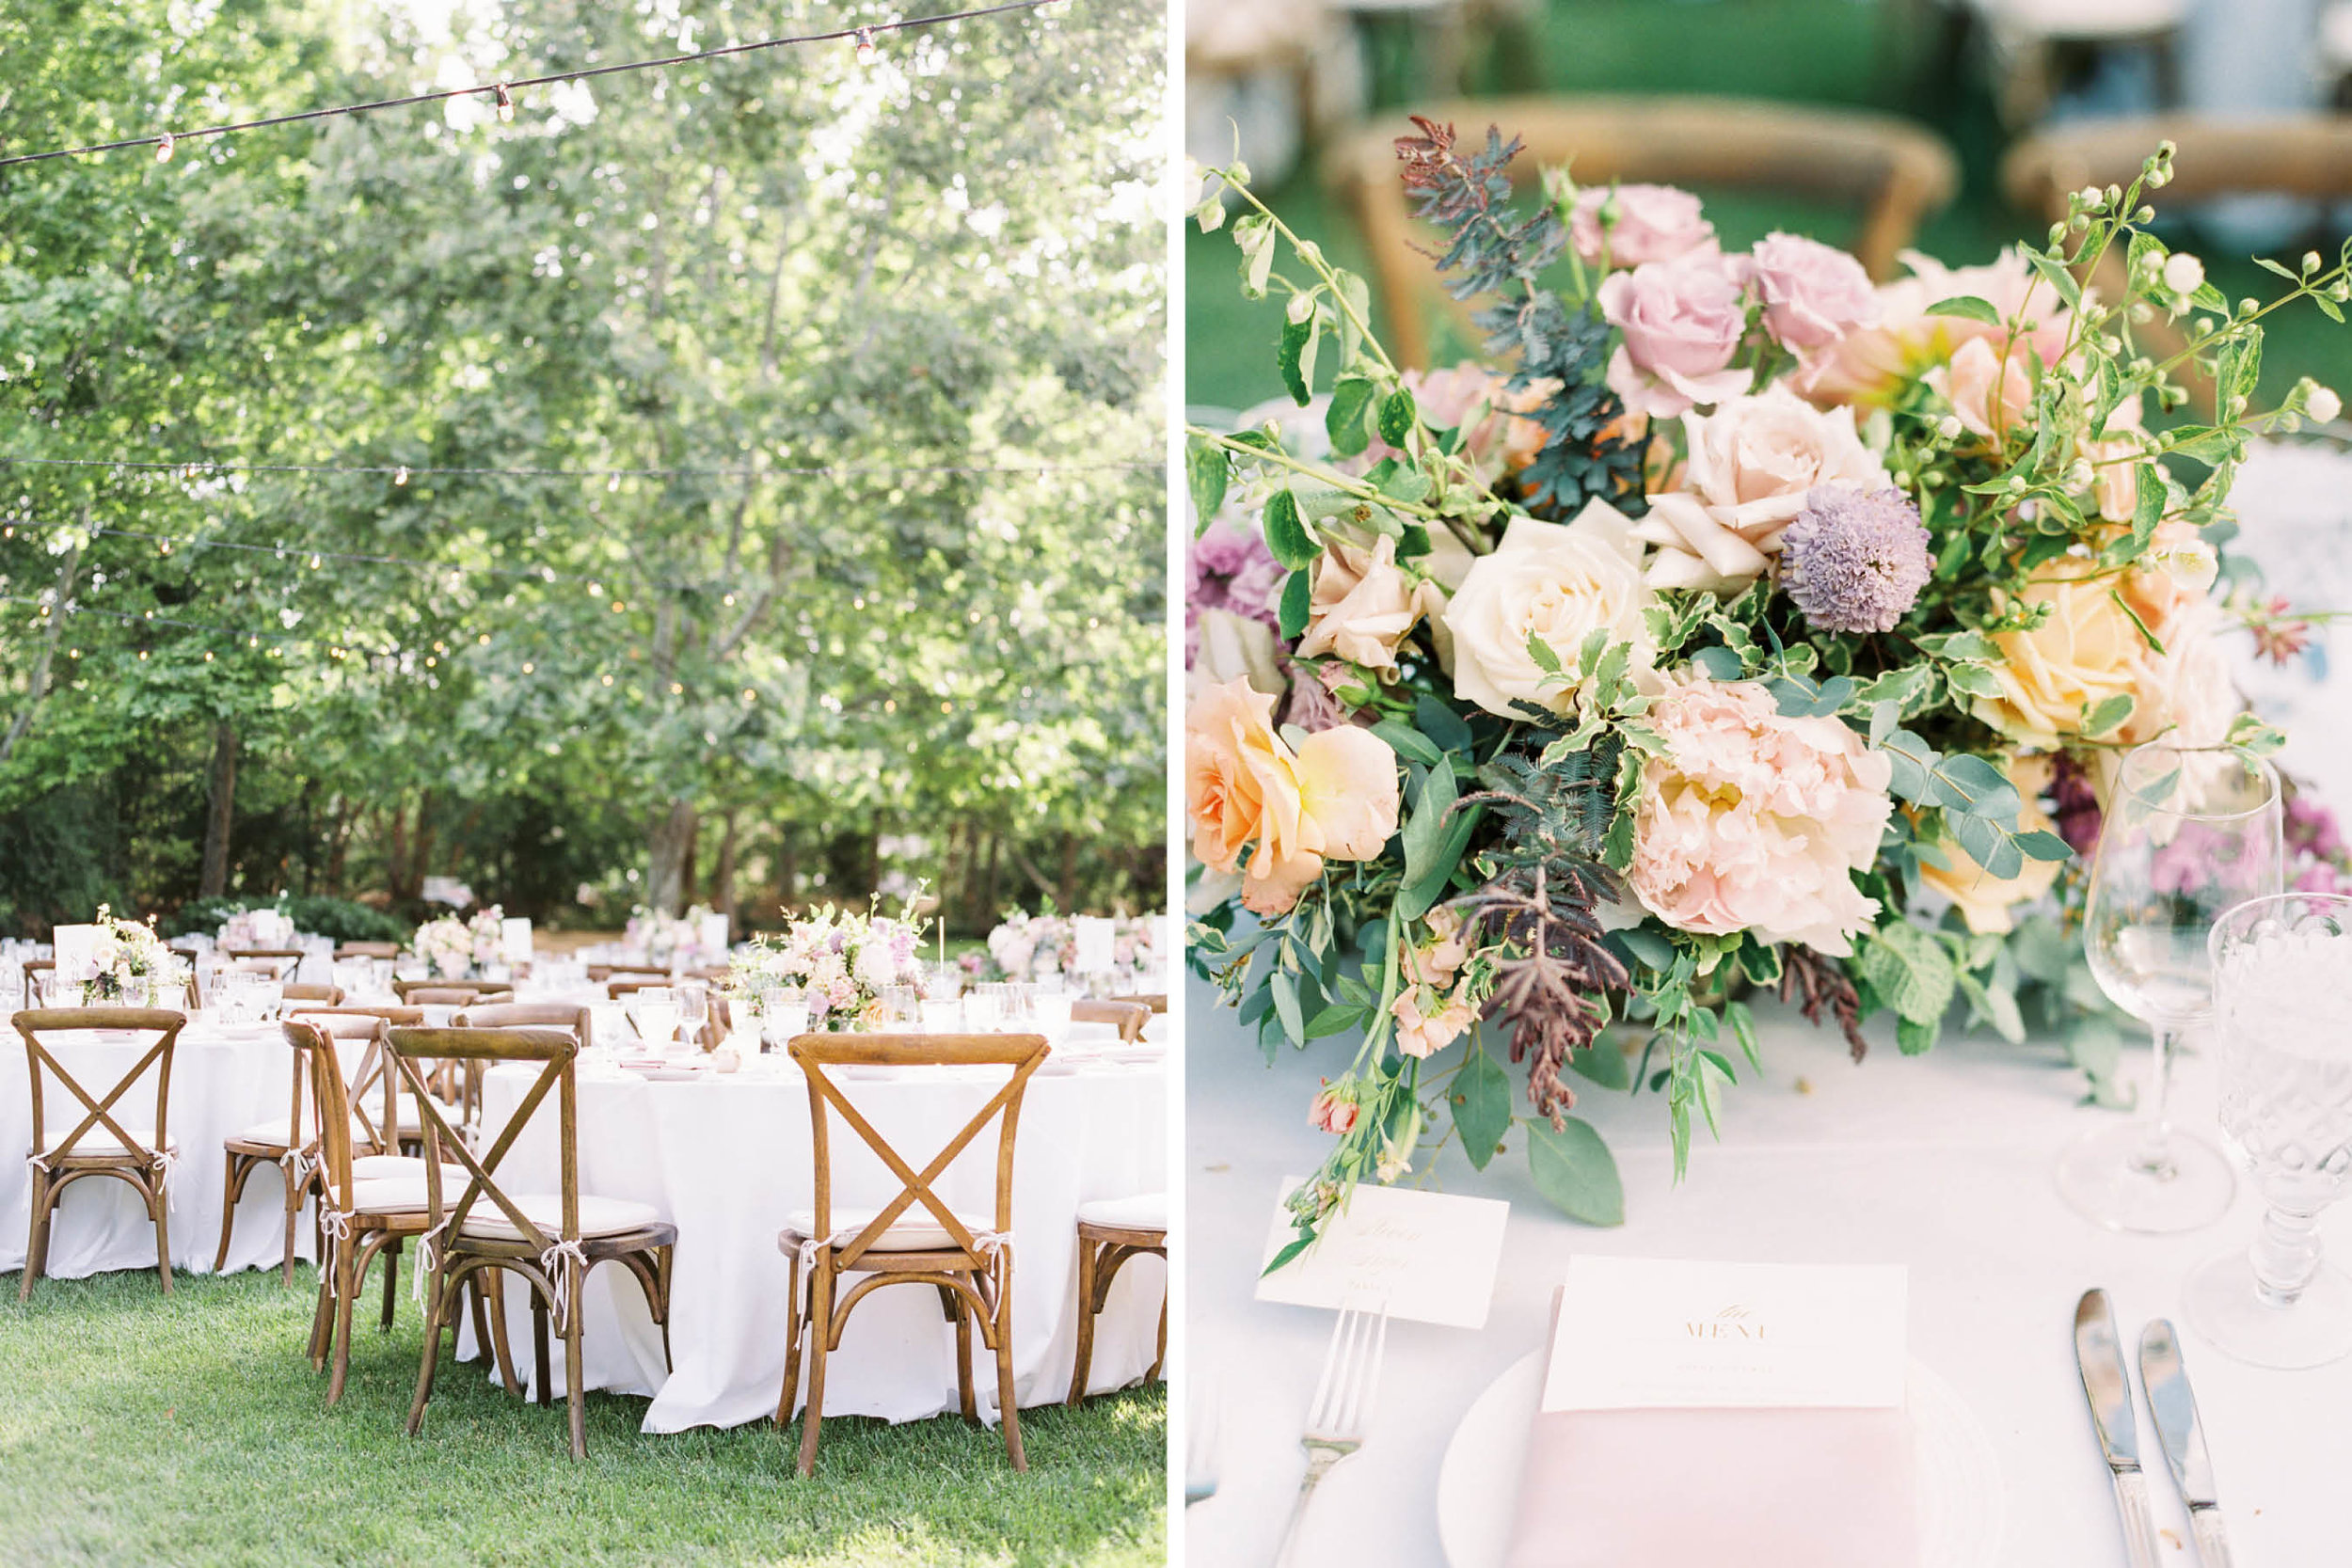 alegria-by-design-wedding-planner-planning-event-design-santa-barbara-day-of-coordinator-kestrel-park-santa-ynez-fields-castle-lavender-garden-mrs-box (39).jpg